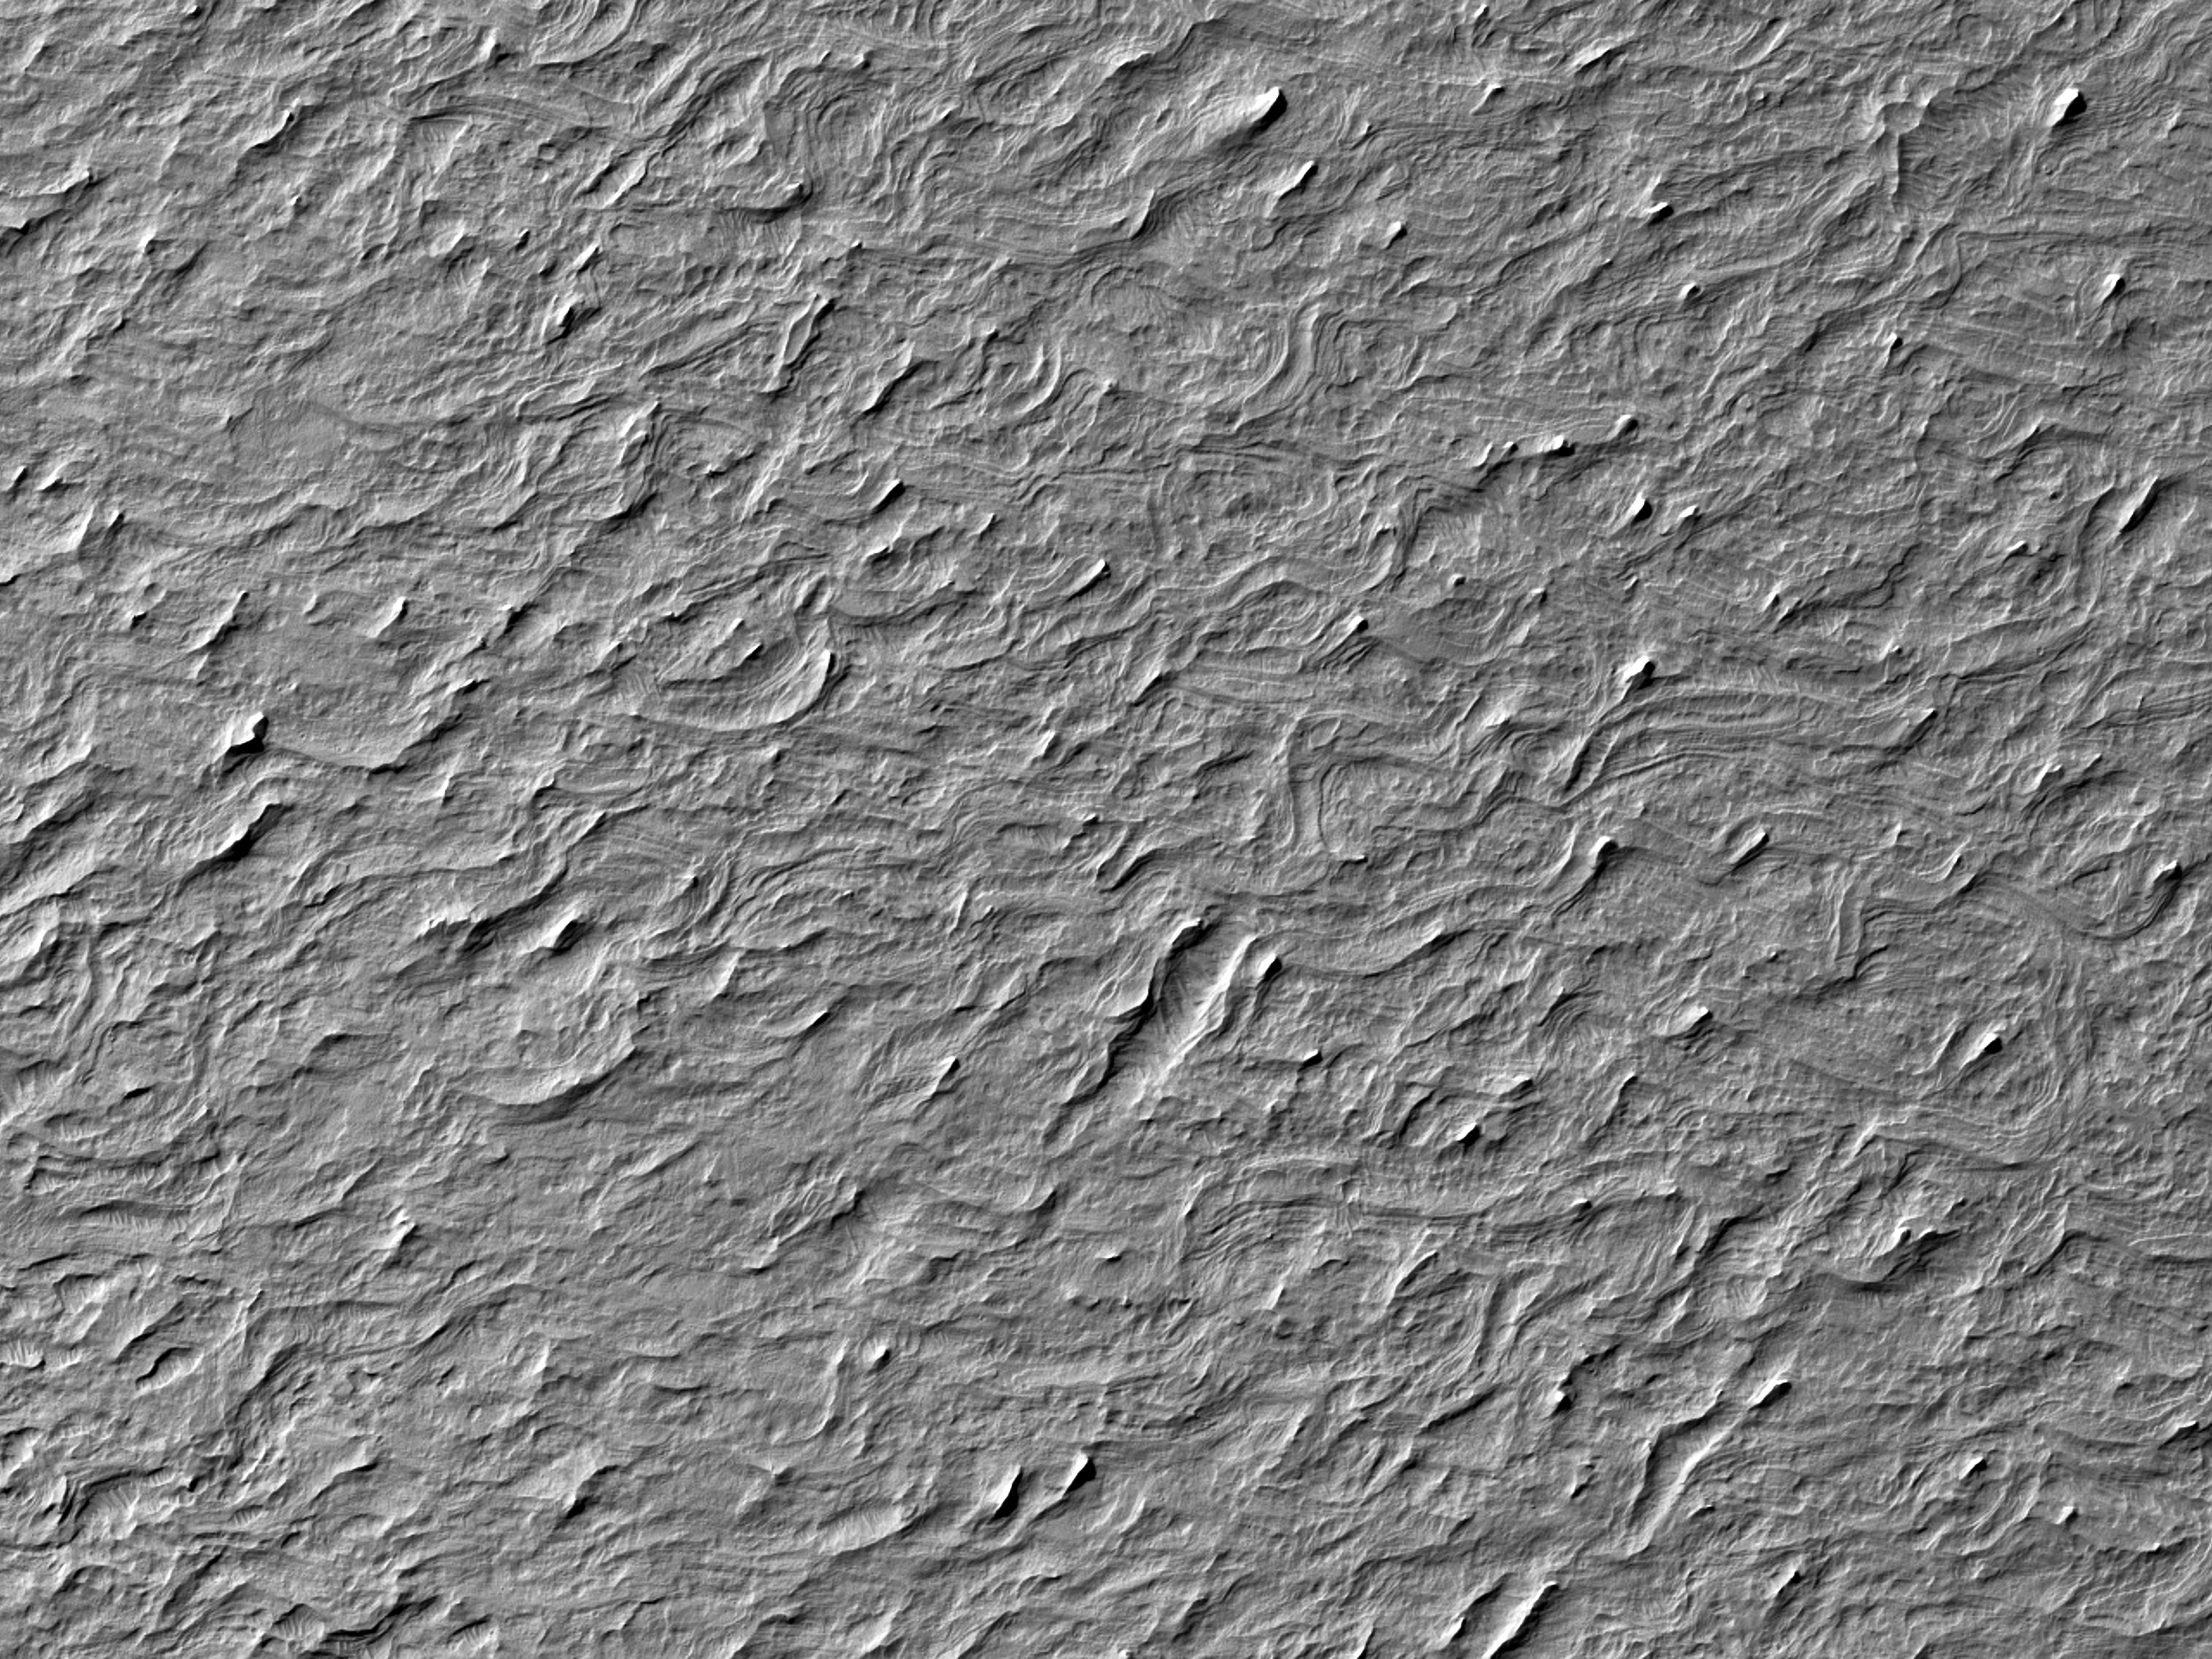 Teren ondulat în Medusae Fossae